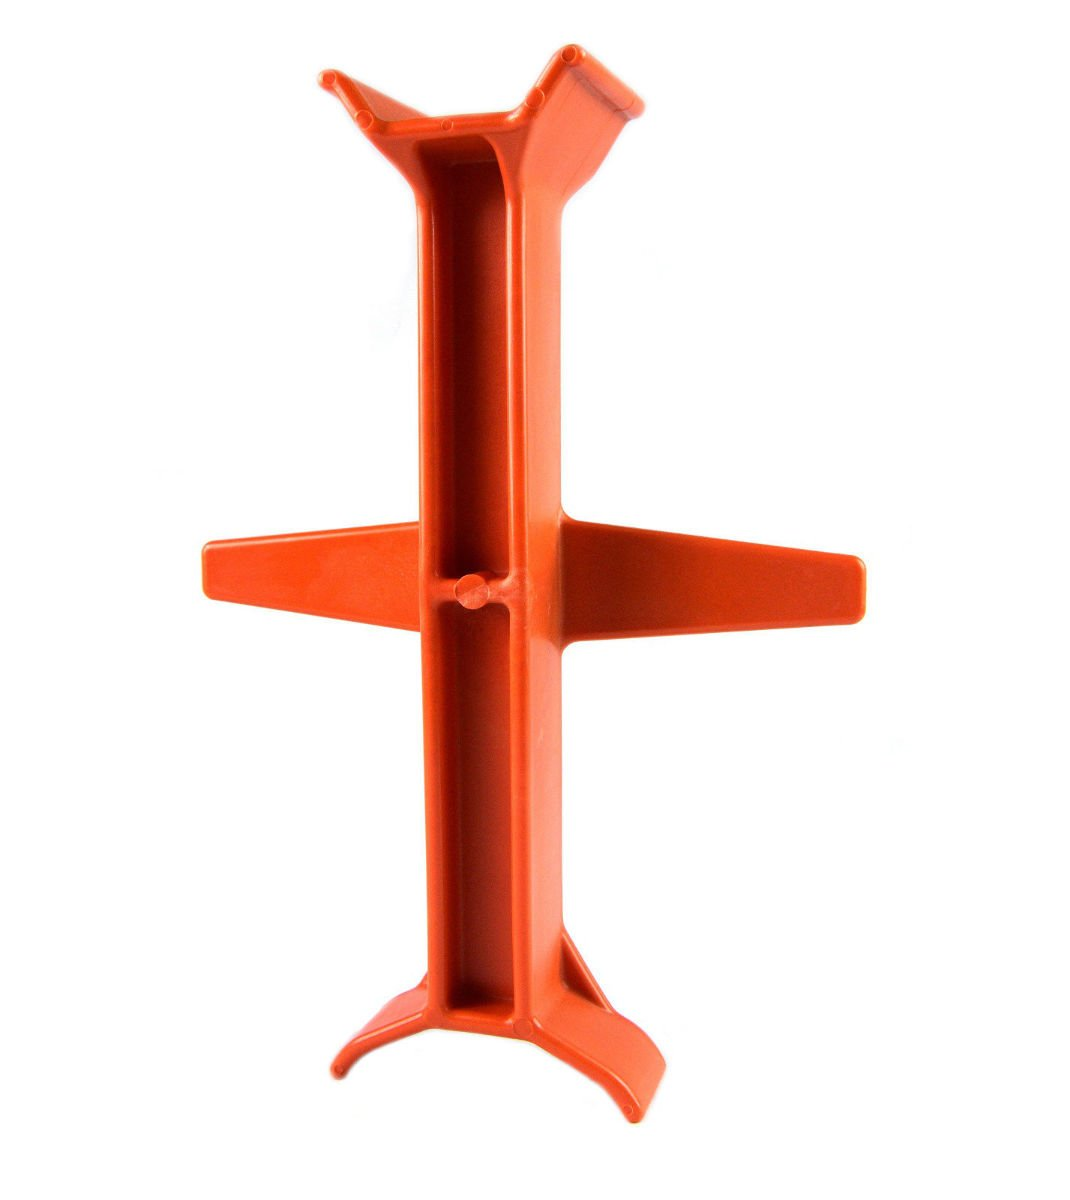 SRT Fork Saver Support Brace Full Size Orange SRT00014 Dirt Bike Motorcycle